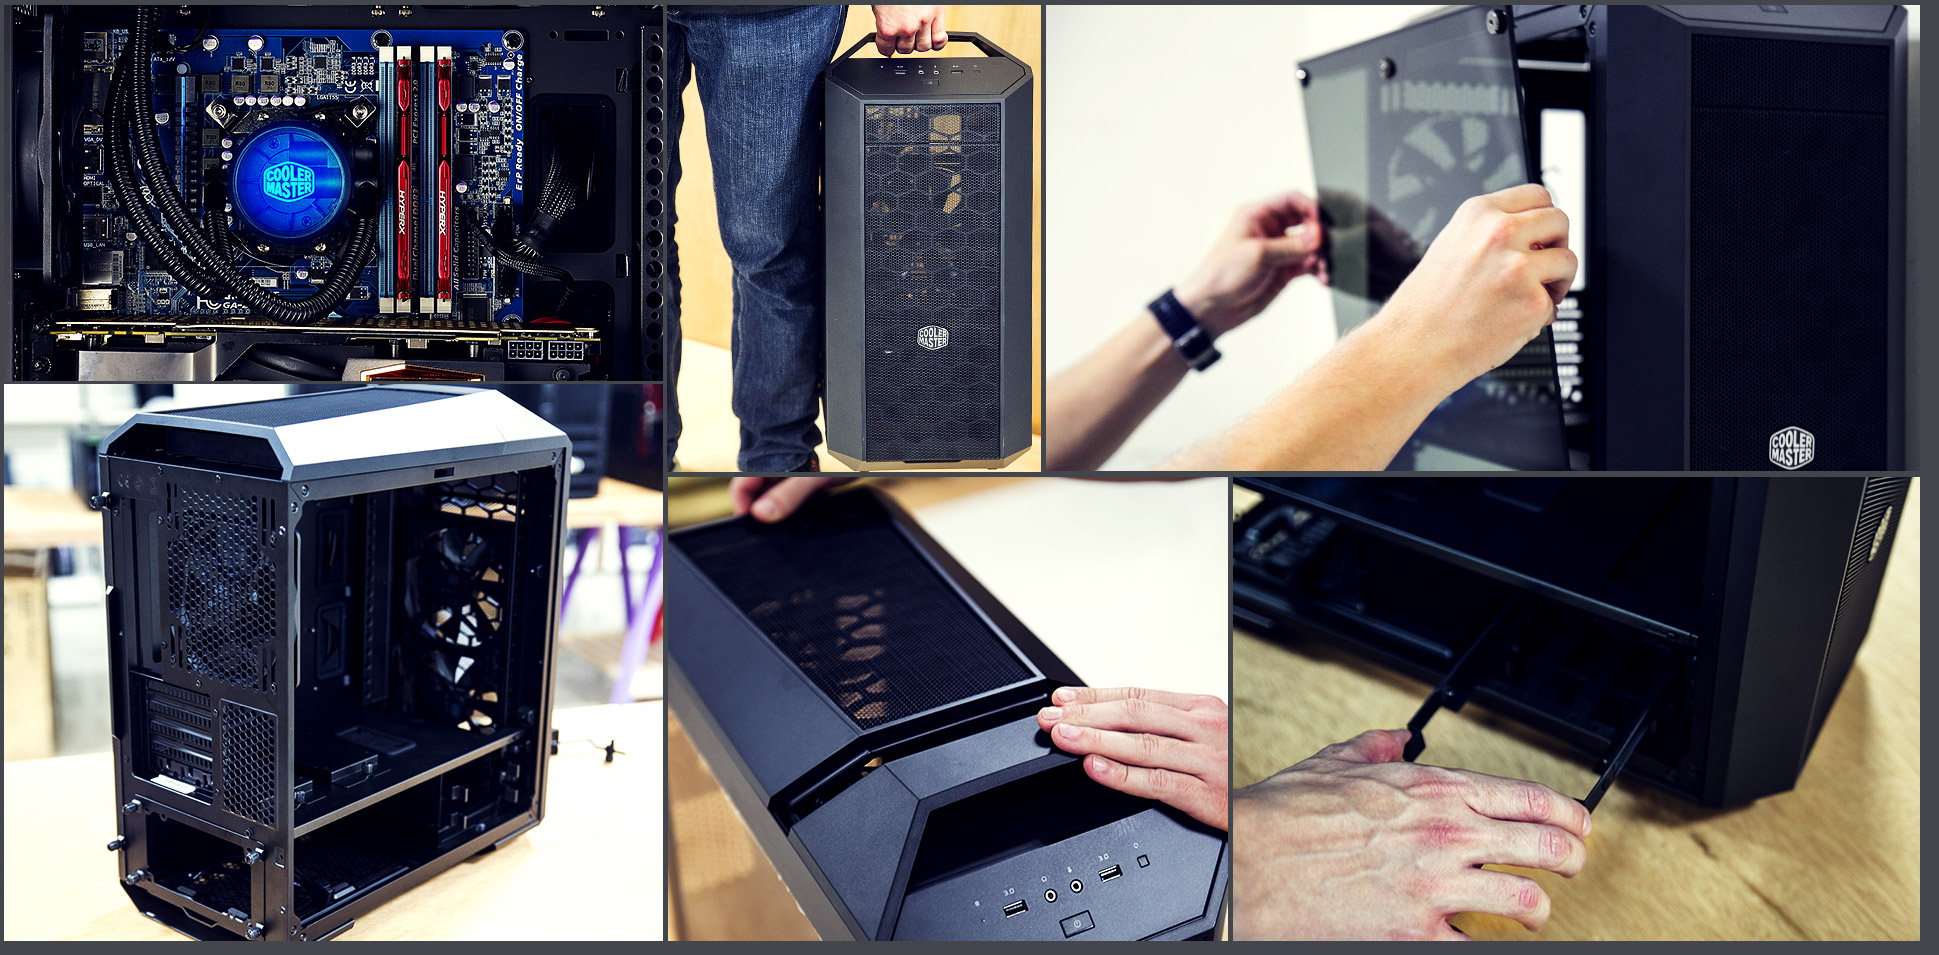 Cooler Master MasterCase Pro 3 Micro-ATX with FreeForm Modular System